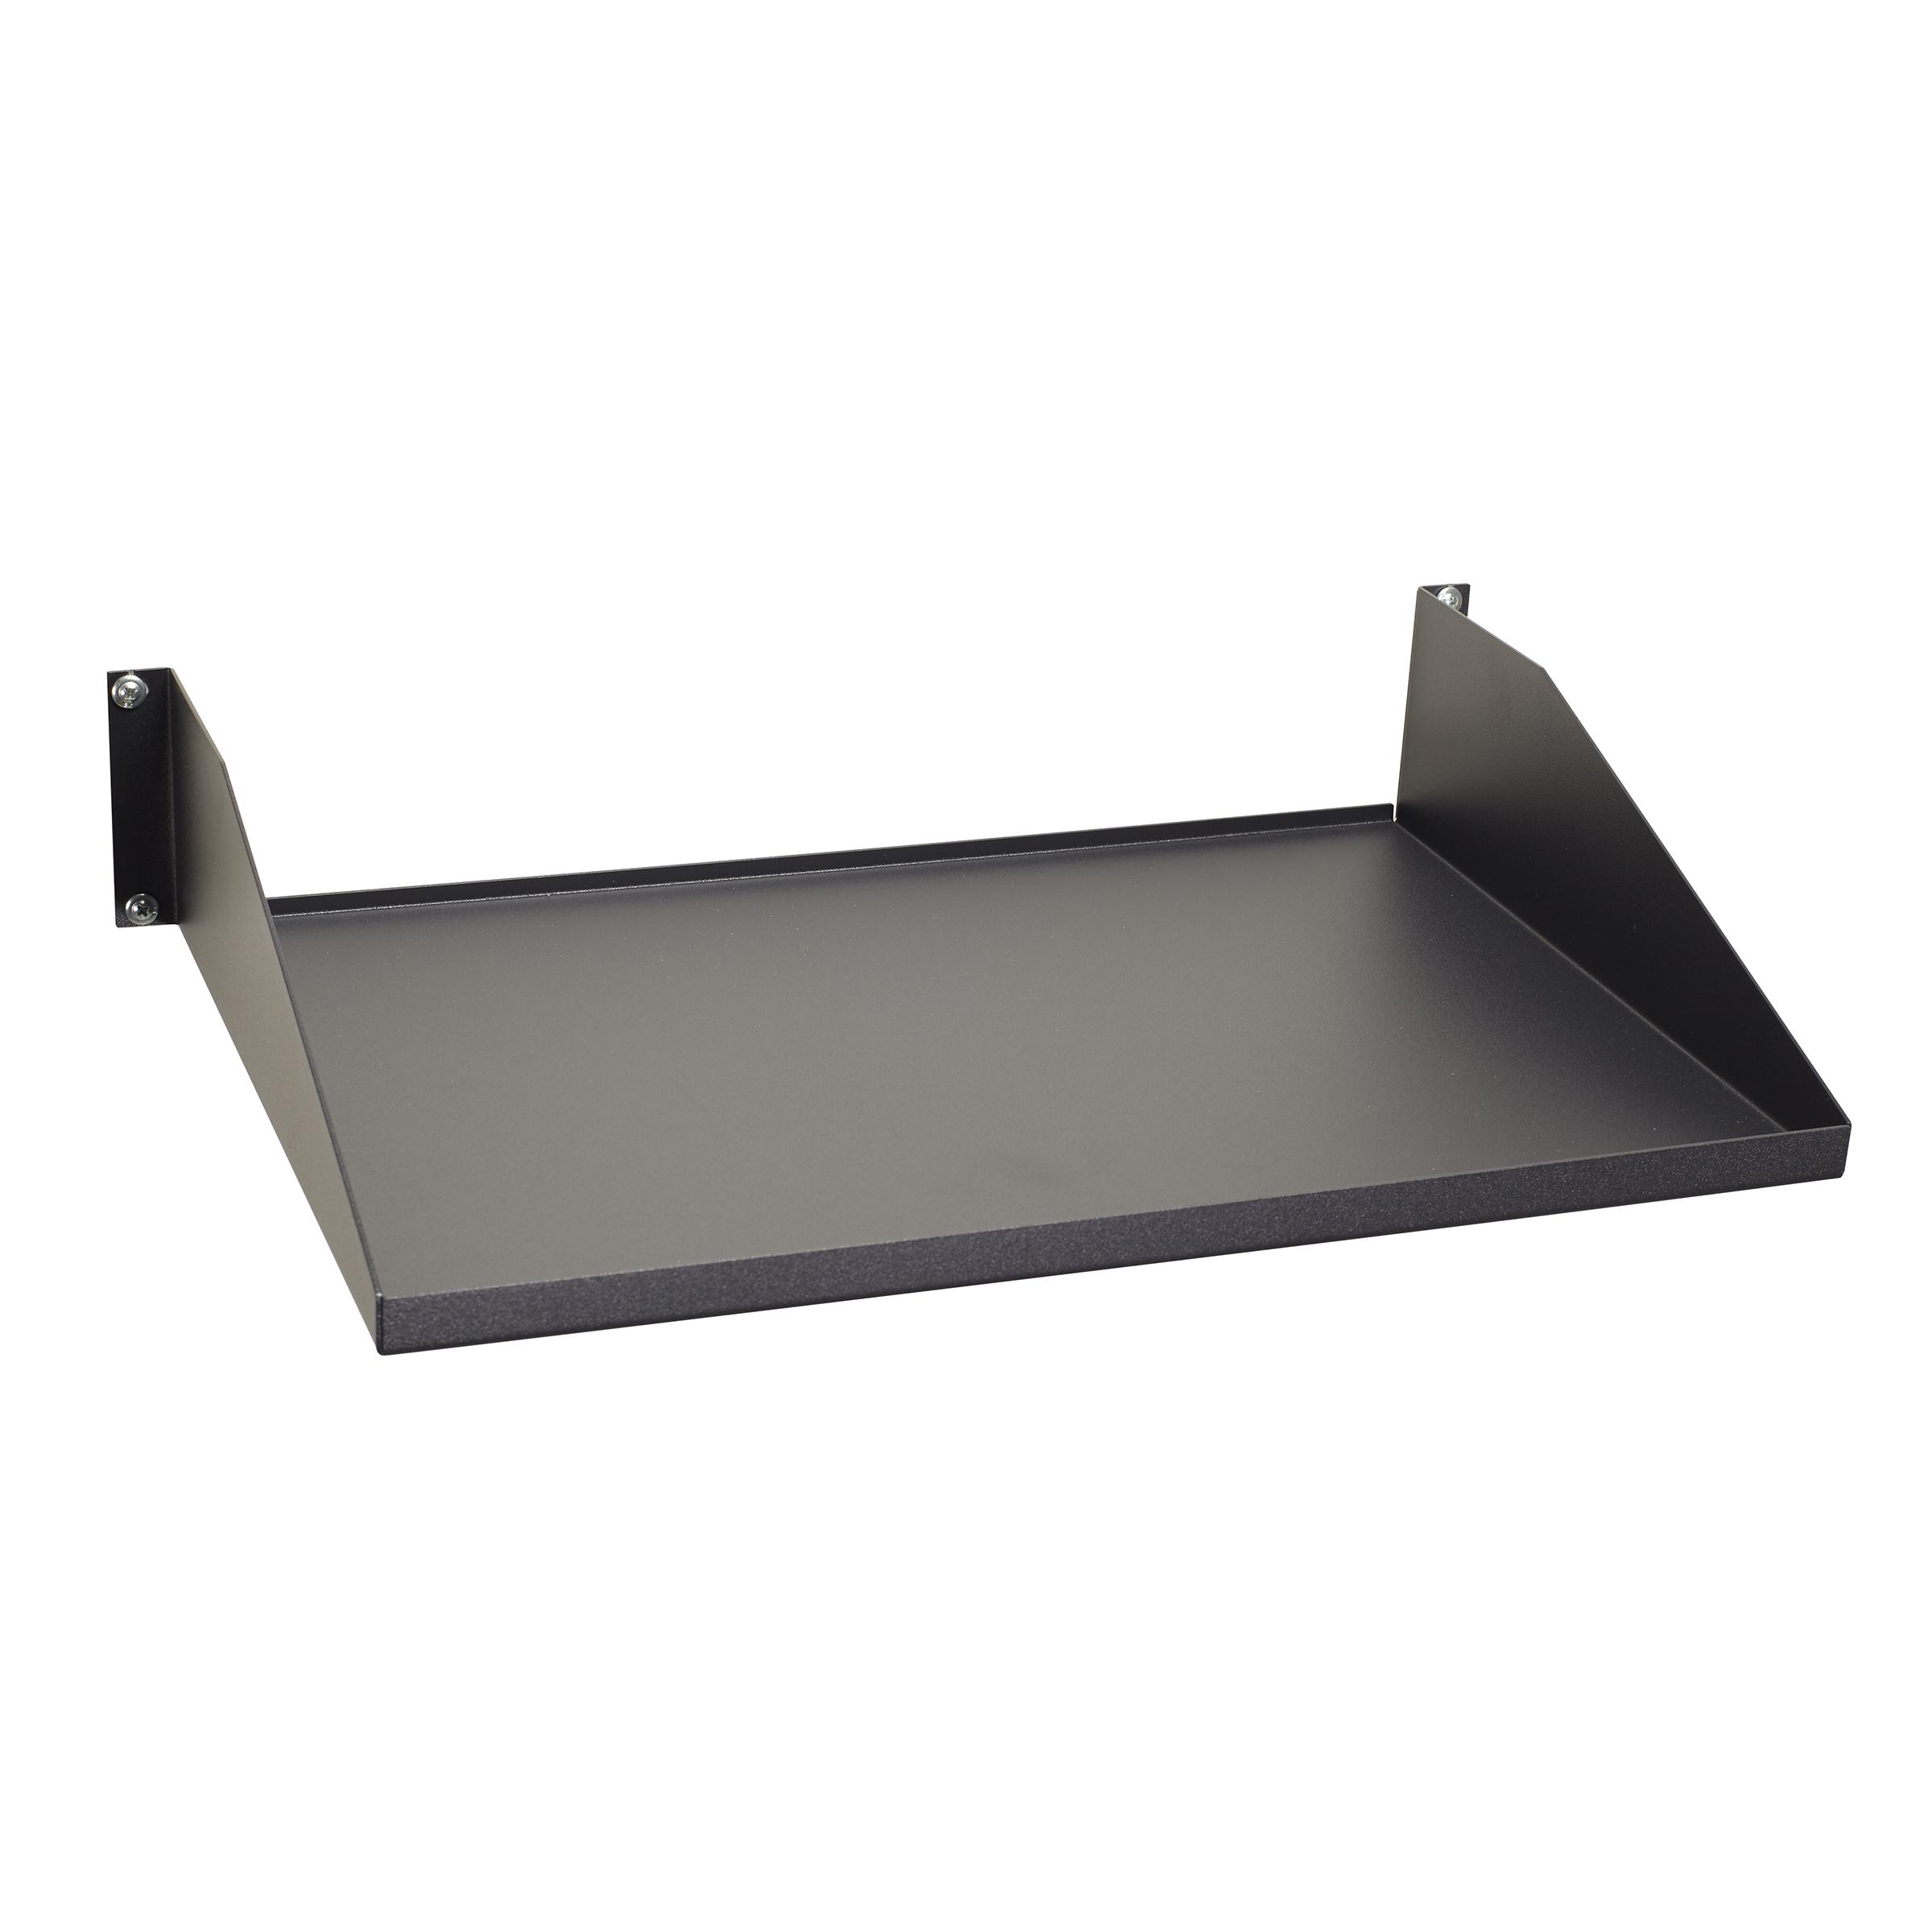 inch shelf aluminum shelves wood wall sedentary rack floating